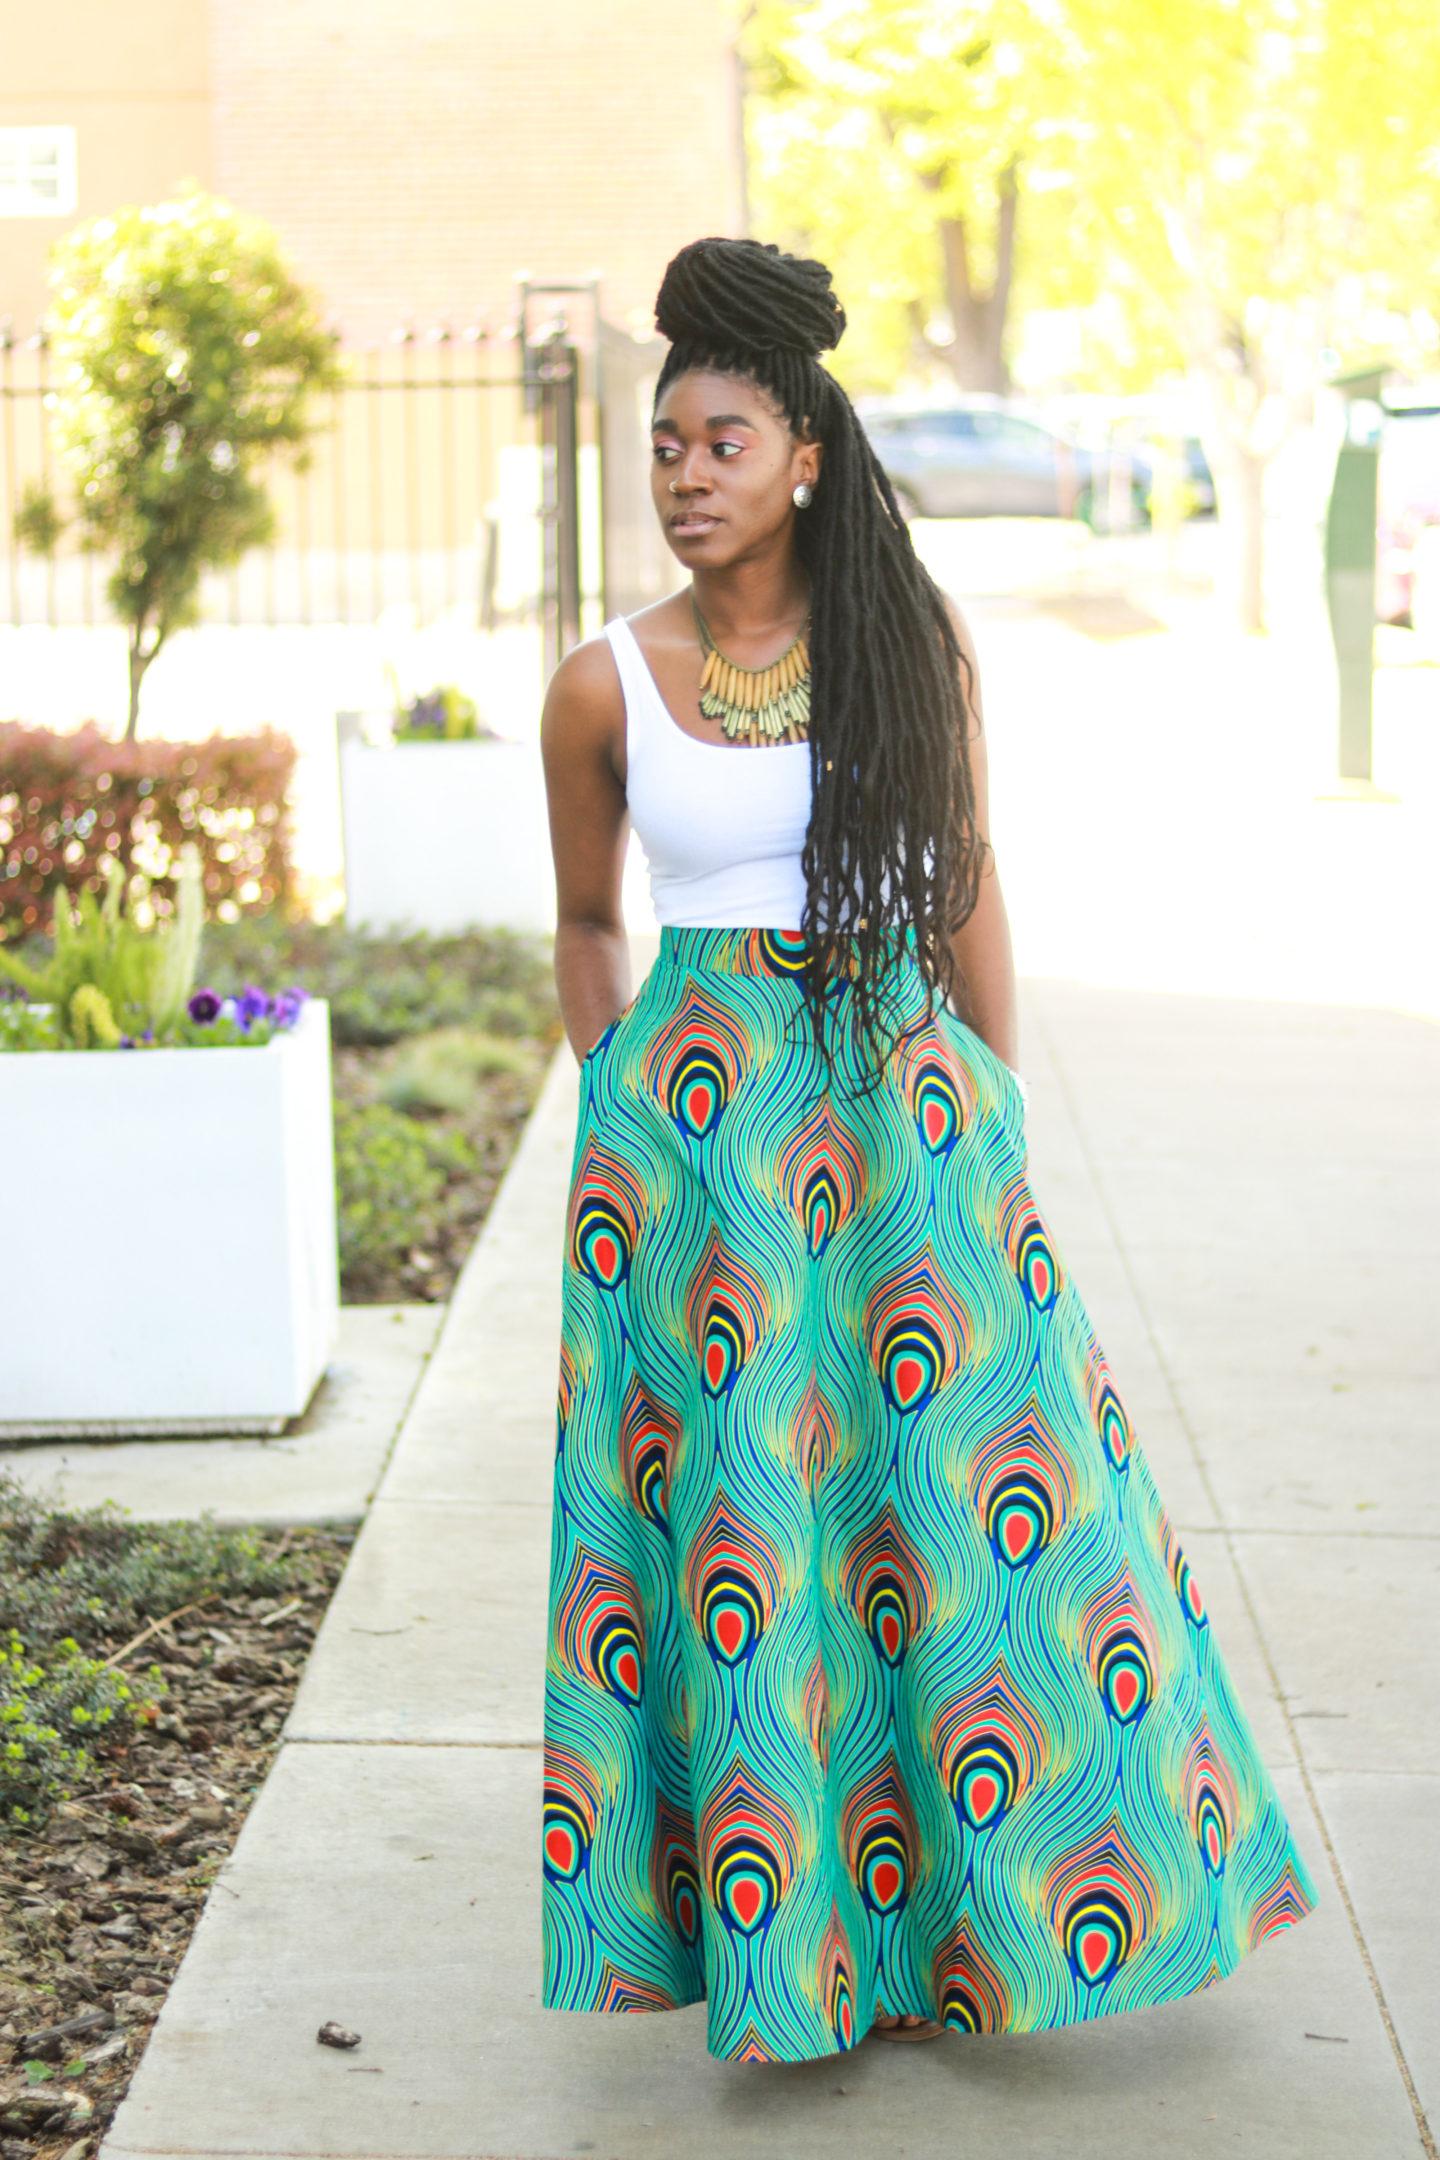 DIY Half Circle Skirt With Pockets Tutorial - Montoya Mayo